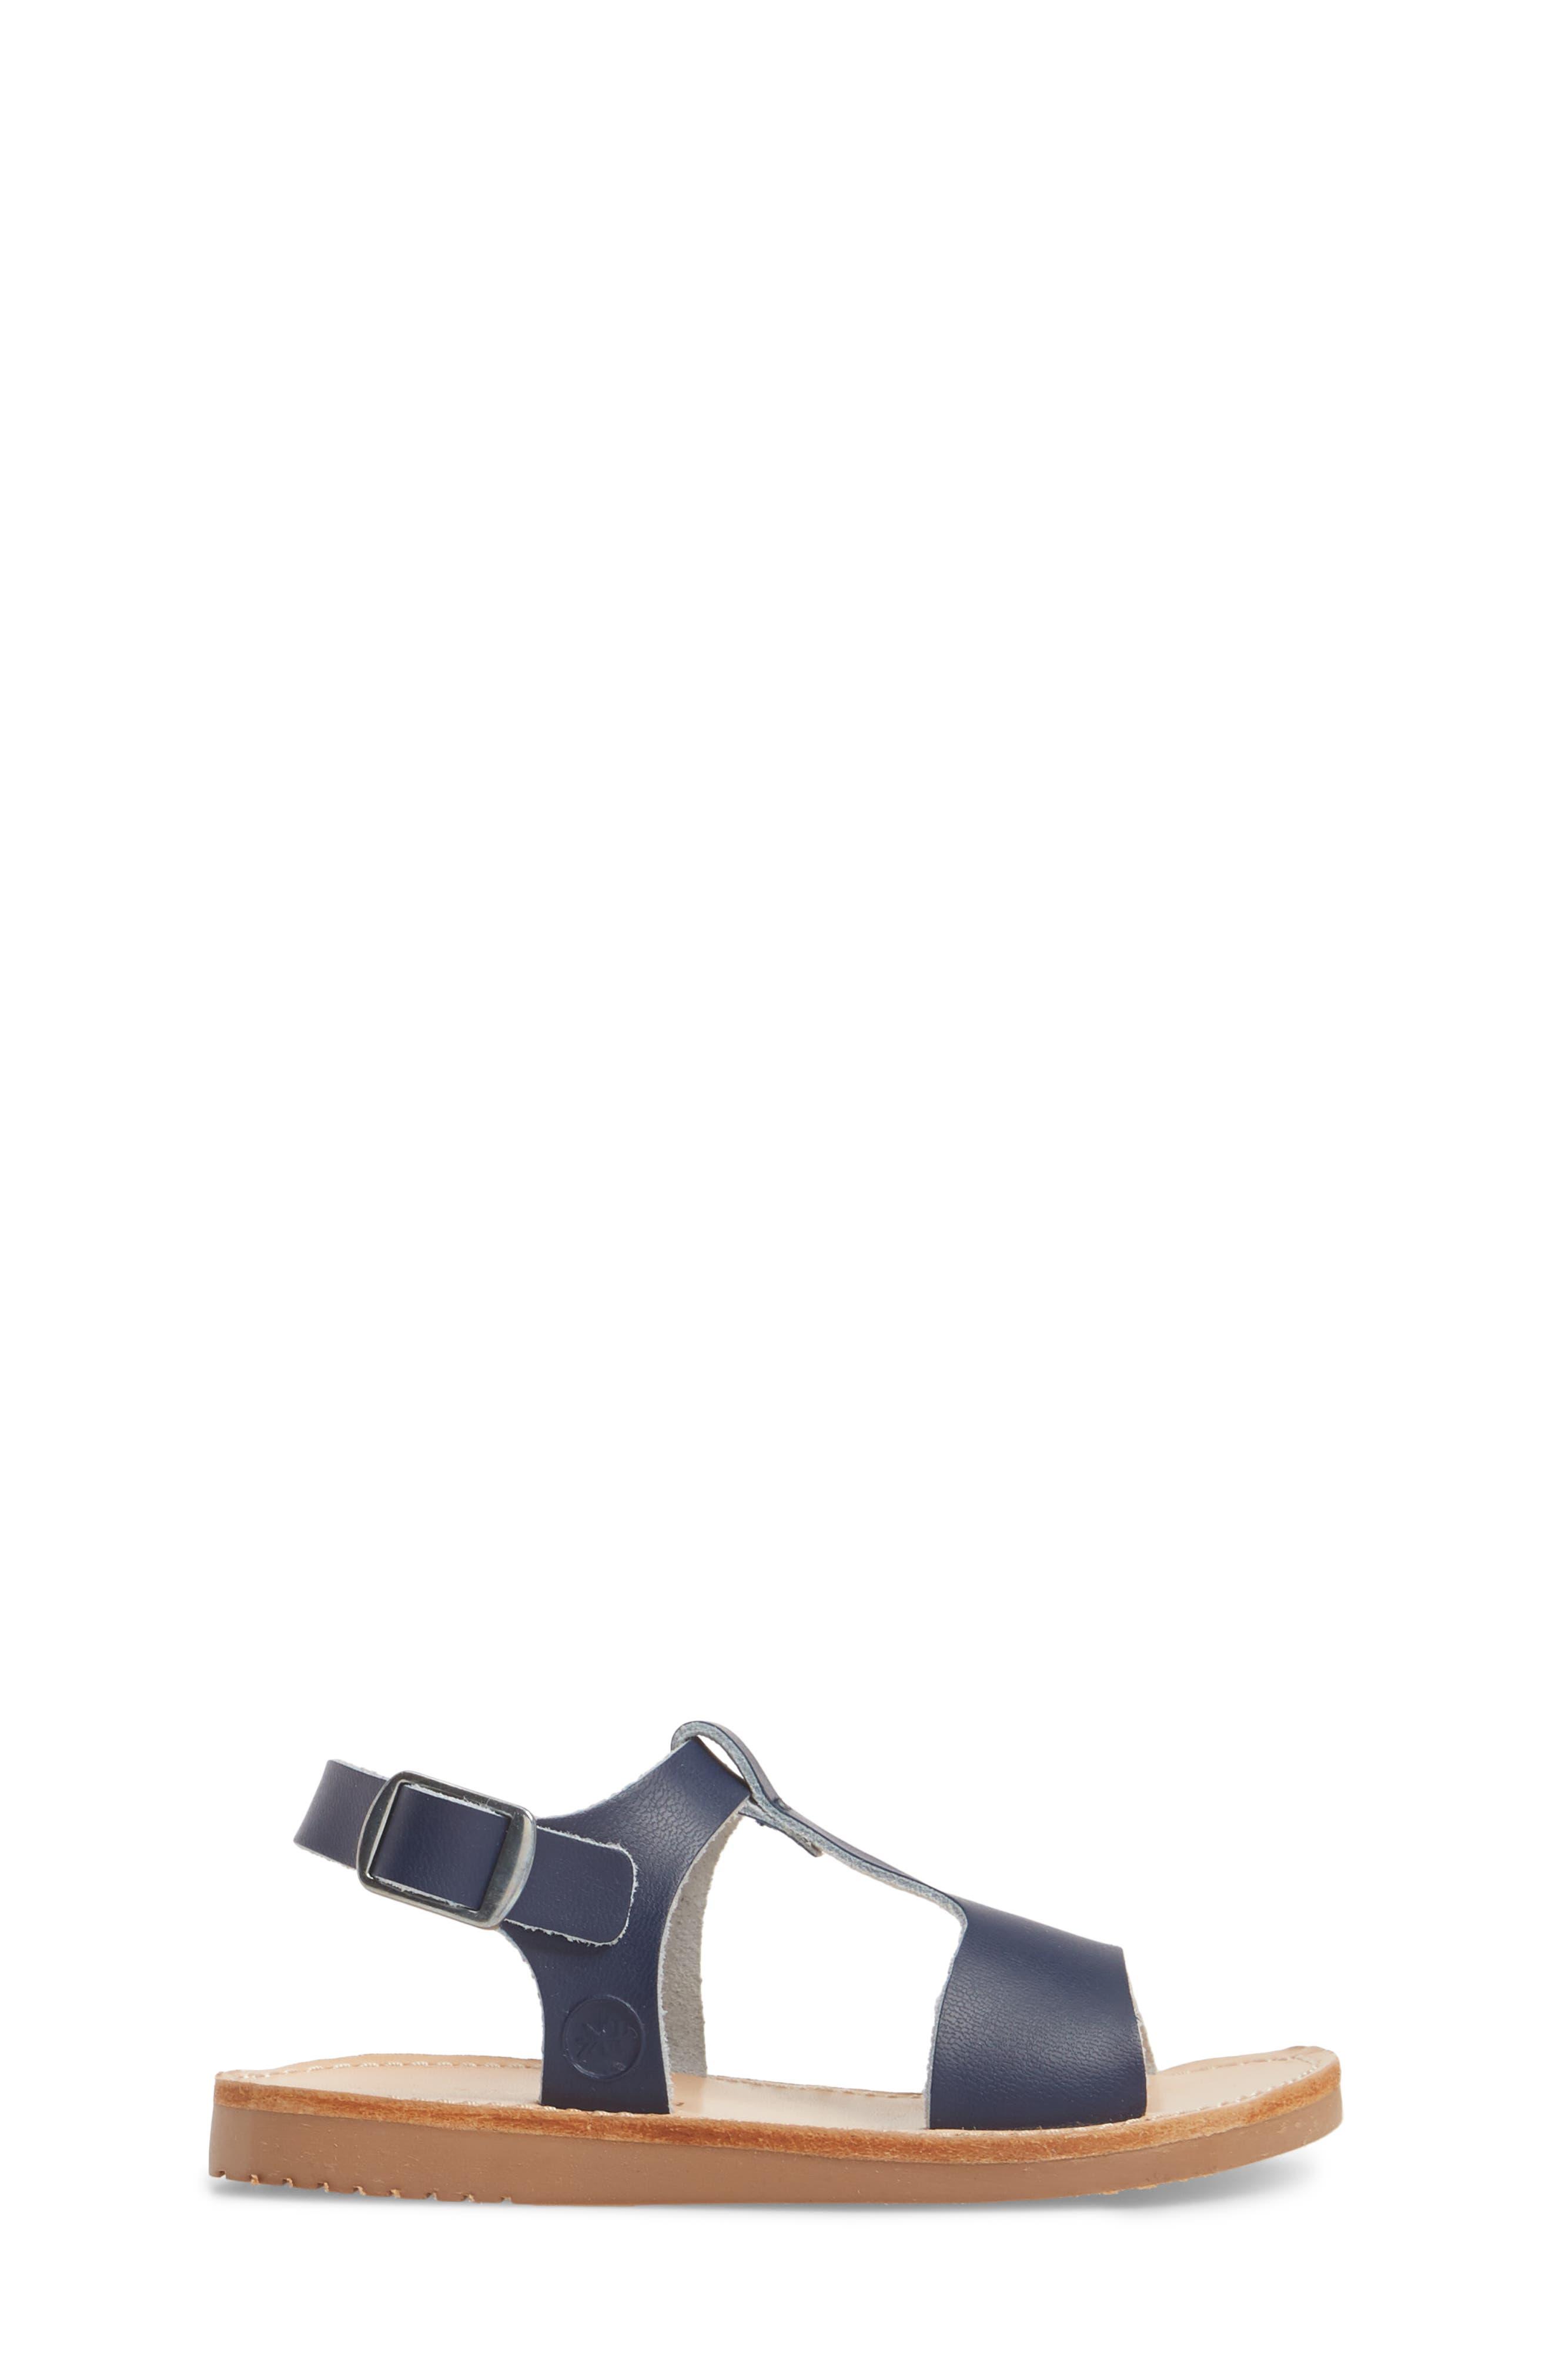 Malibu Water Resistant Sandal,                             Alternate thumbnail 3, color,                             Navy